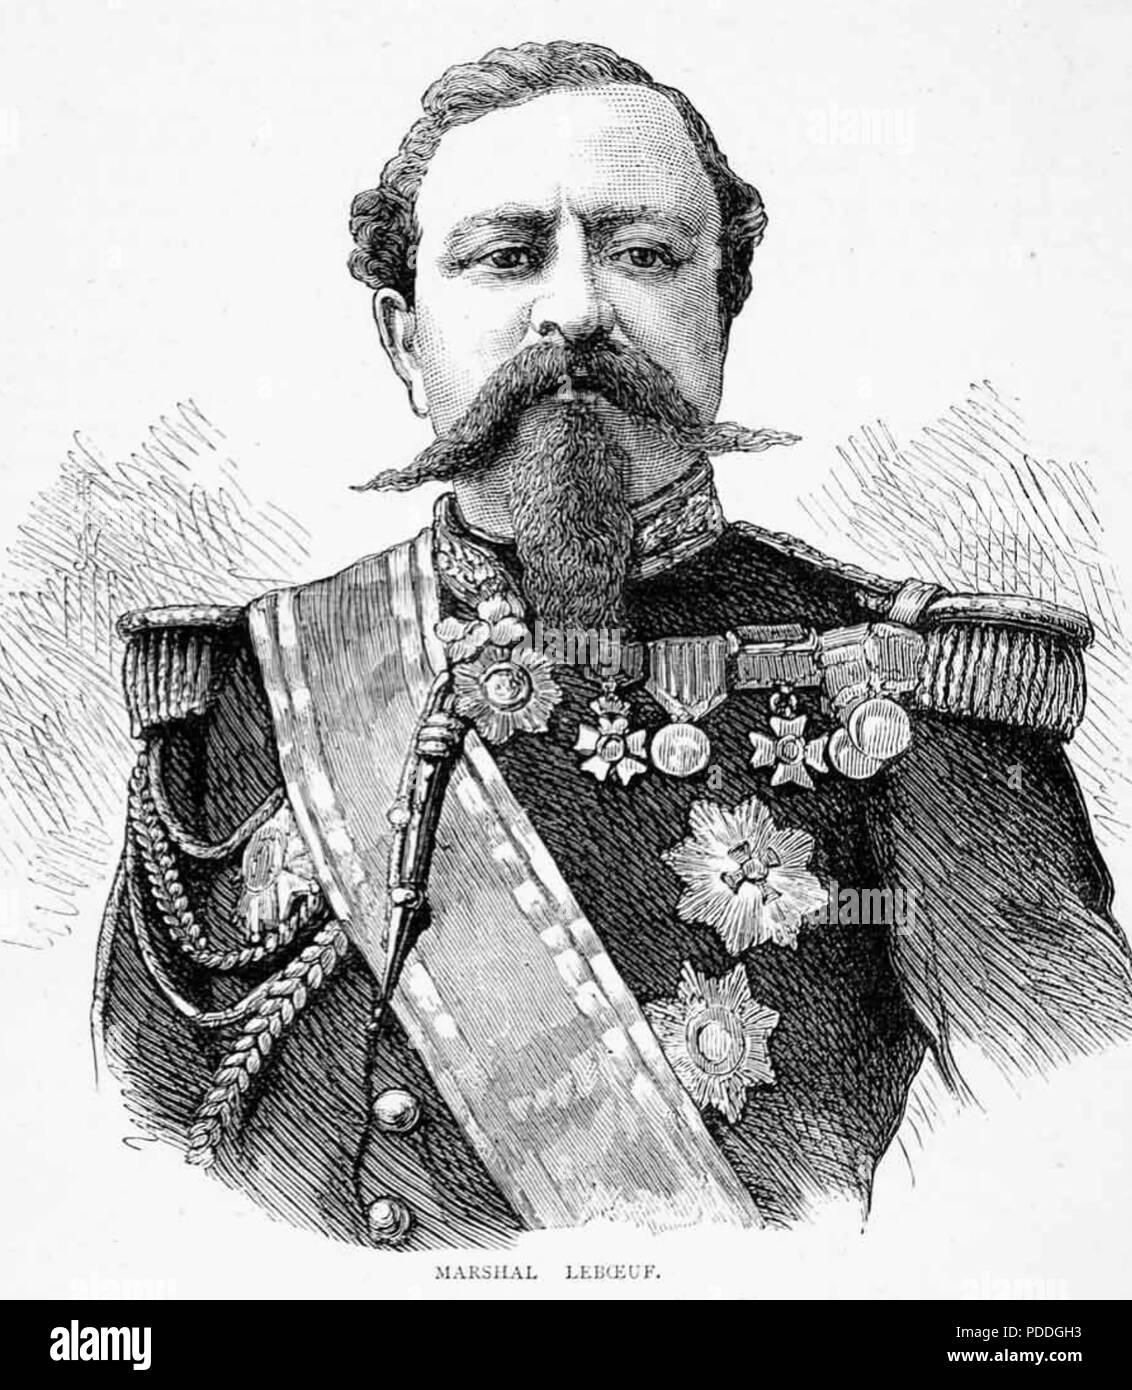 EDMOND LE BOEUF (1809-1888) as a Marshal of France - Stock Image